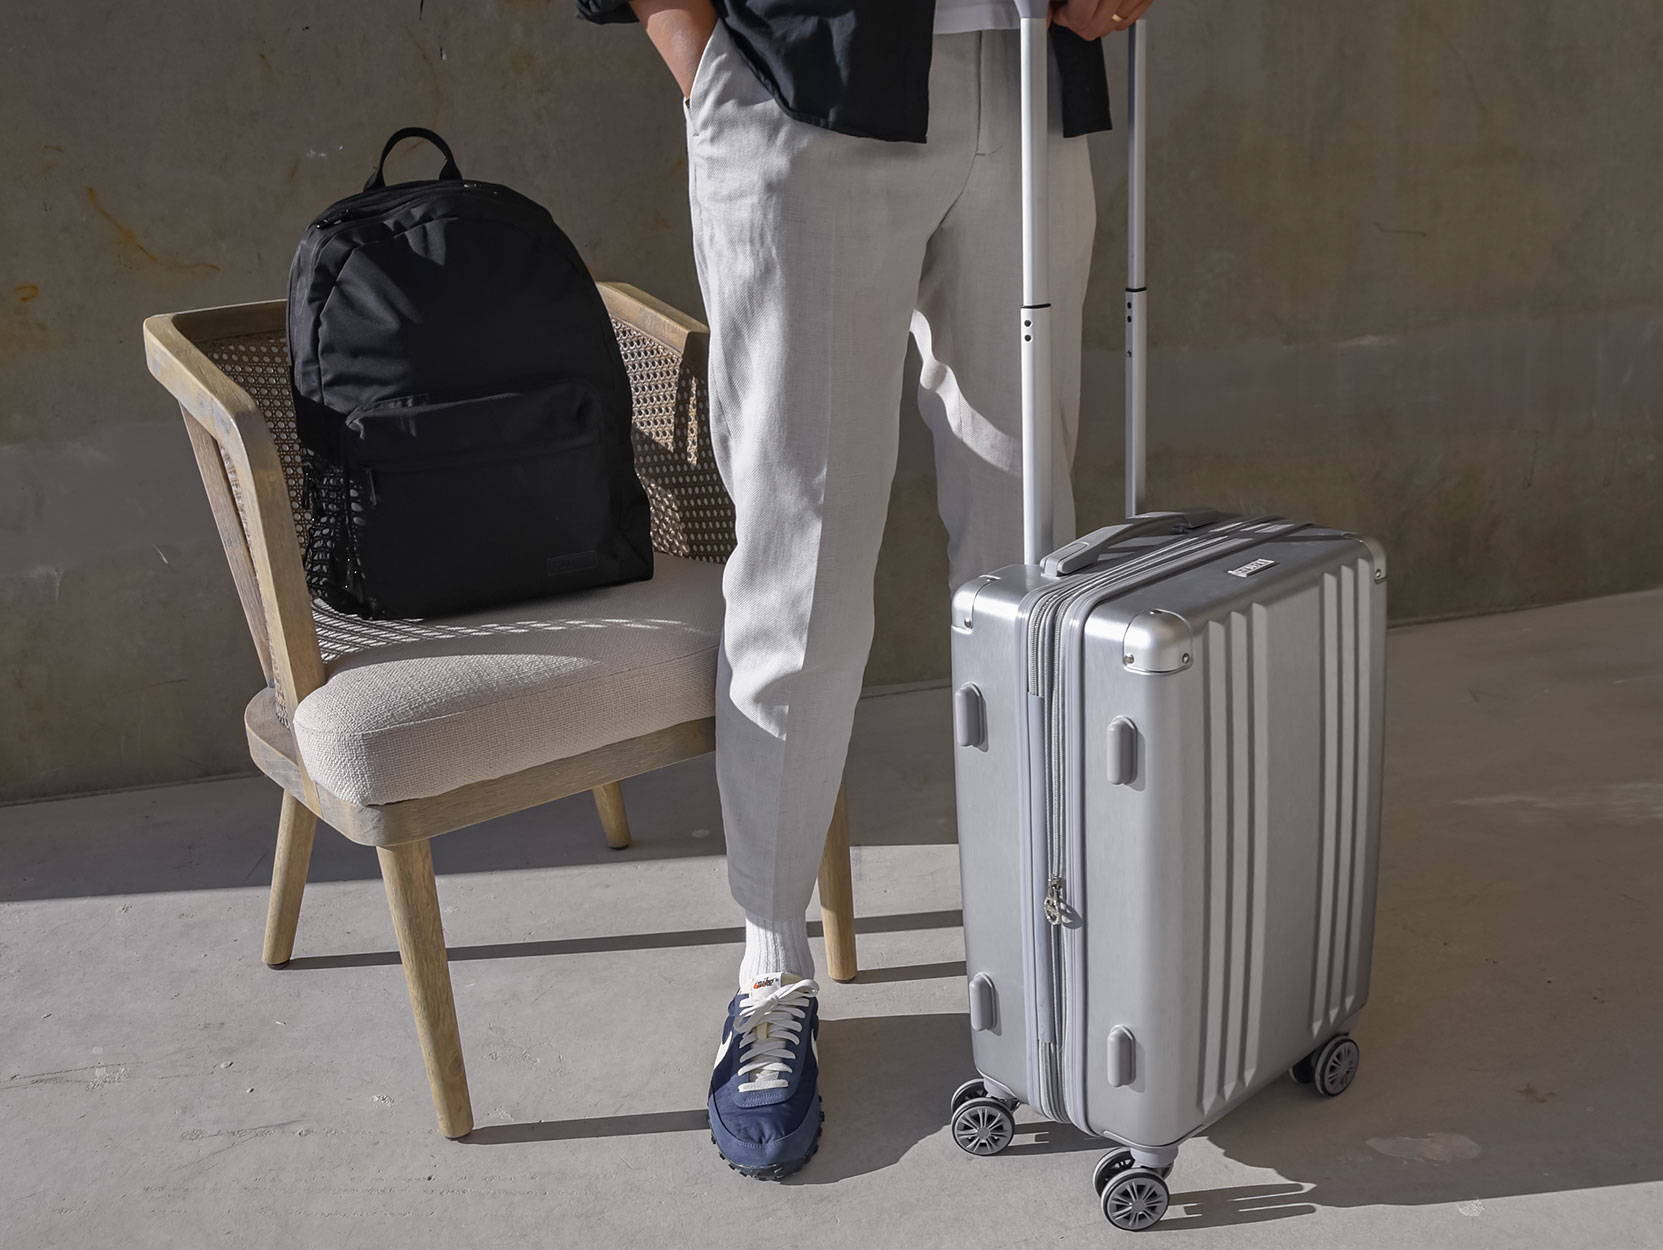 CALPAK Glenroe Backpack in Black and Ambeur Carry-On in Silver.